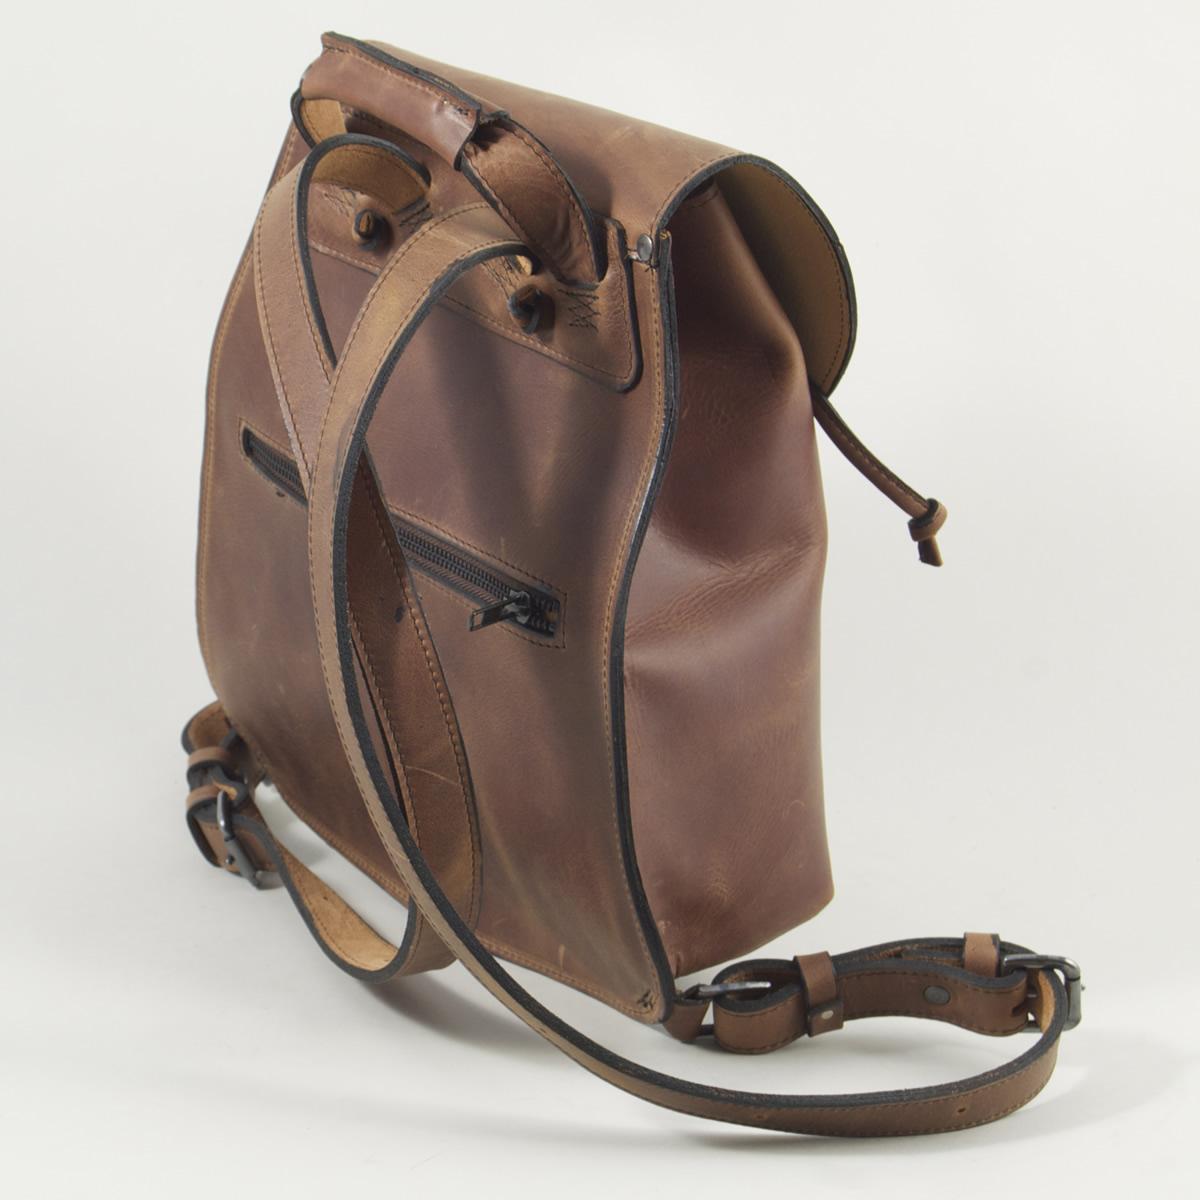 Daypack - Back